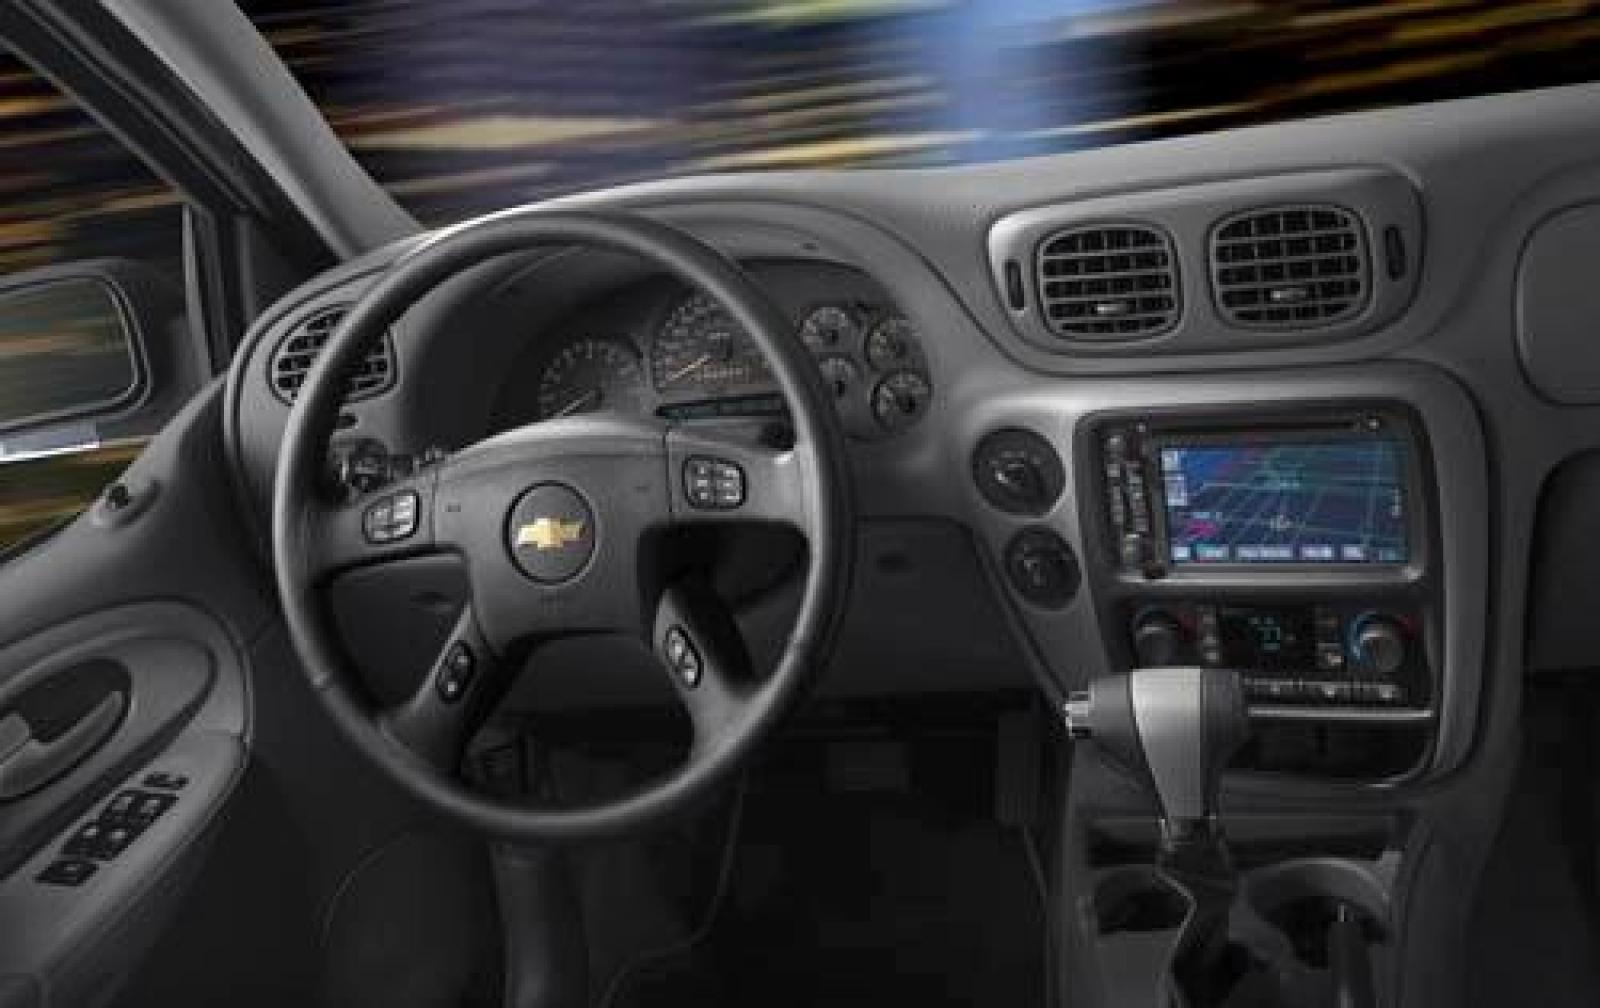 2002 Chevy Trailblazer Interior